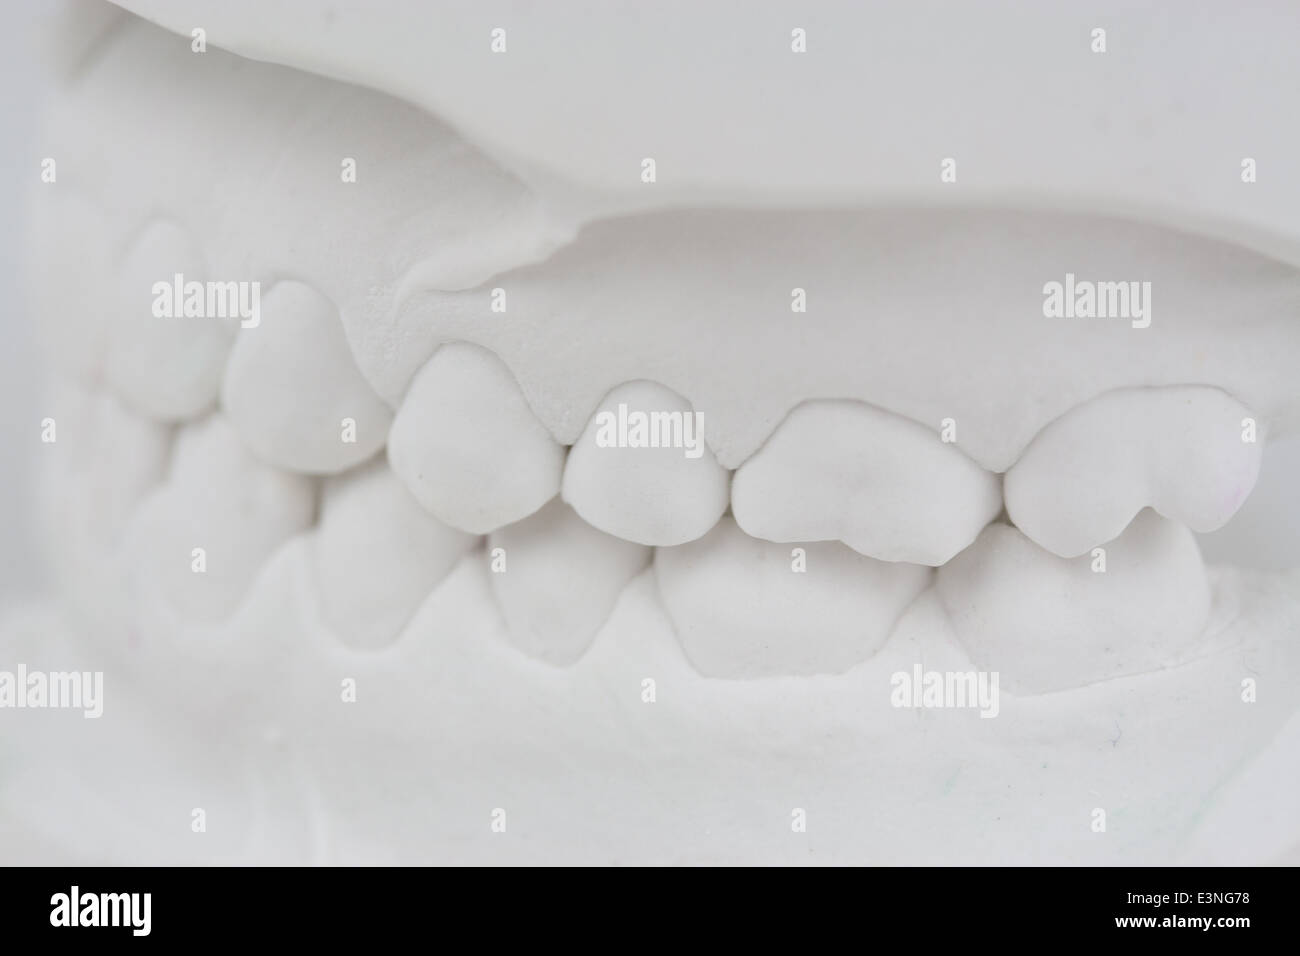 Backenzähne Gipsabdruck Stock Photo